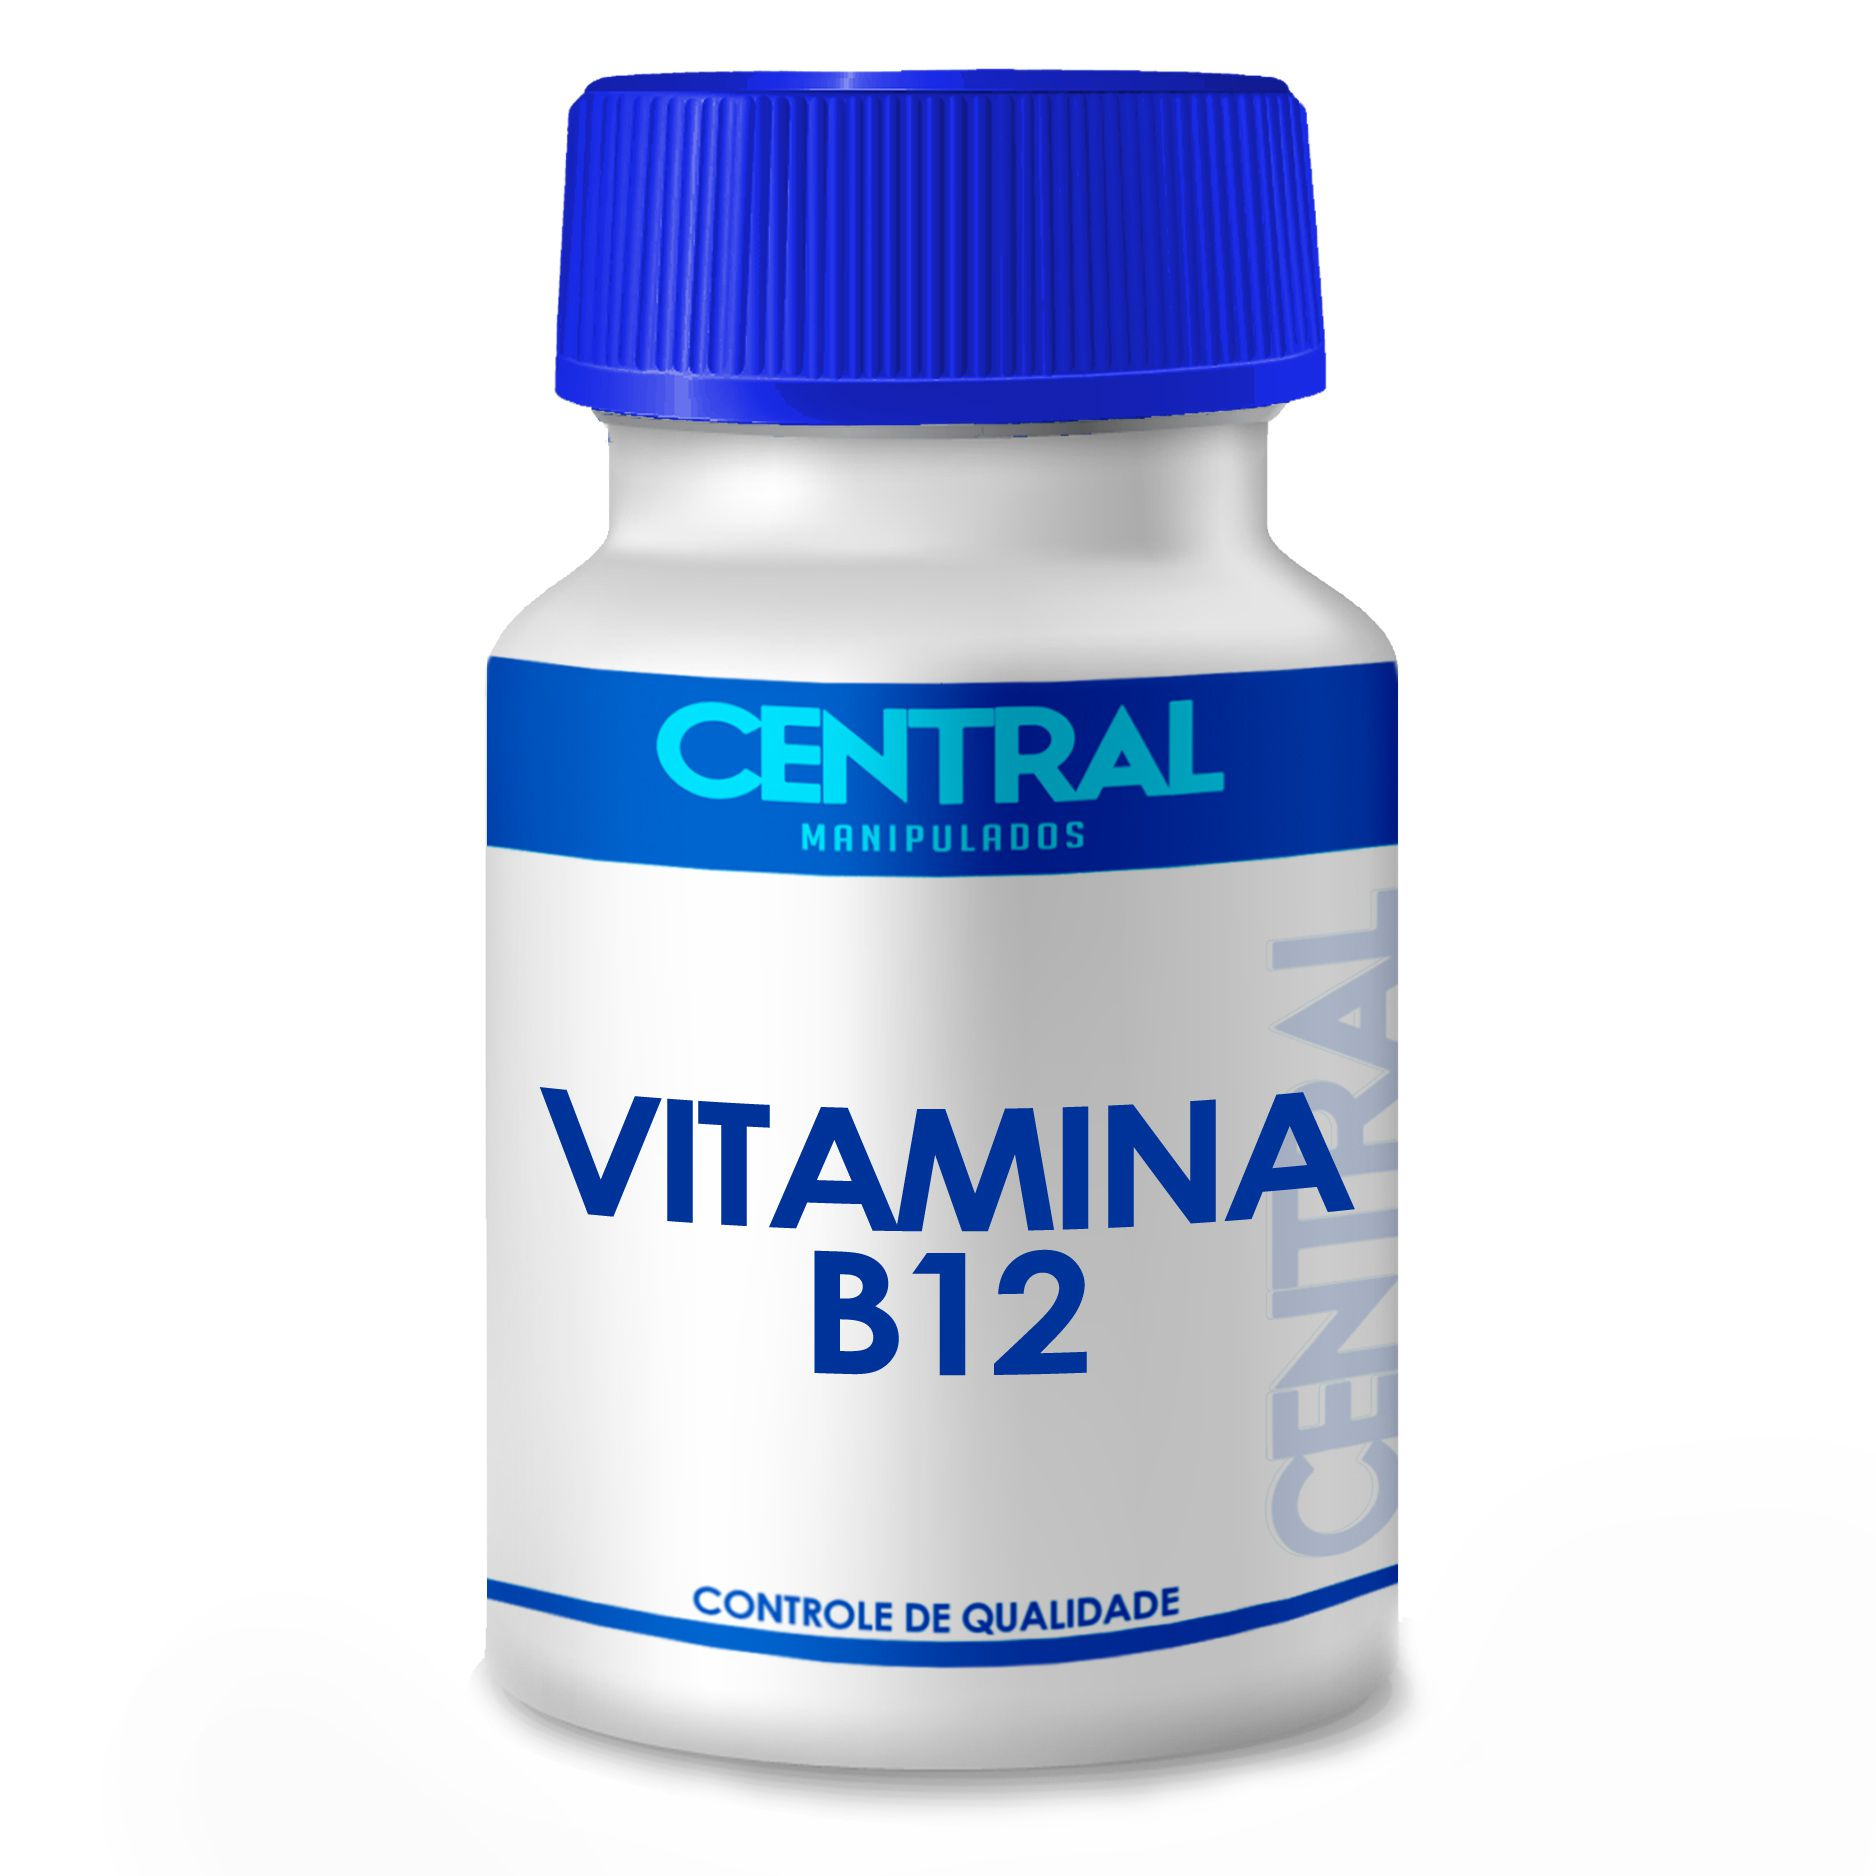 Vitamina B12 - Tratamento de anemia e fortalece o  sistema imunológico - 500mcg 30 Comprimidos Sublingual